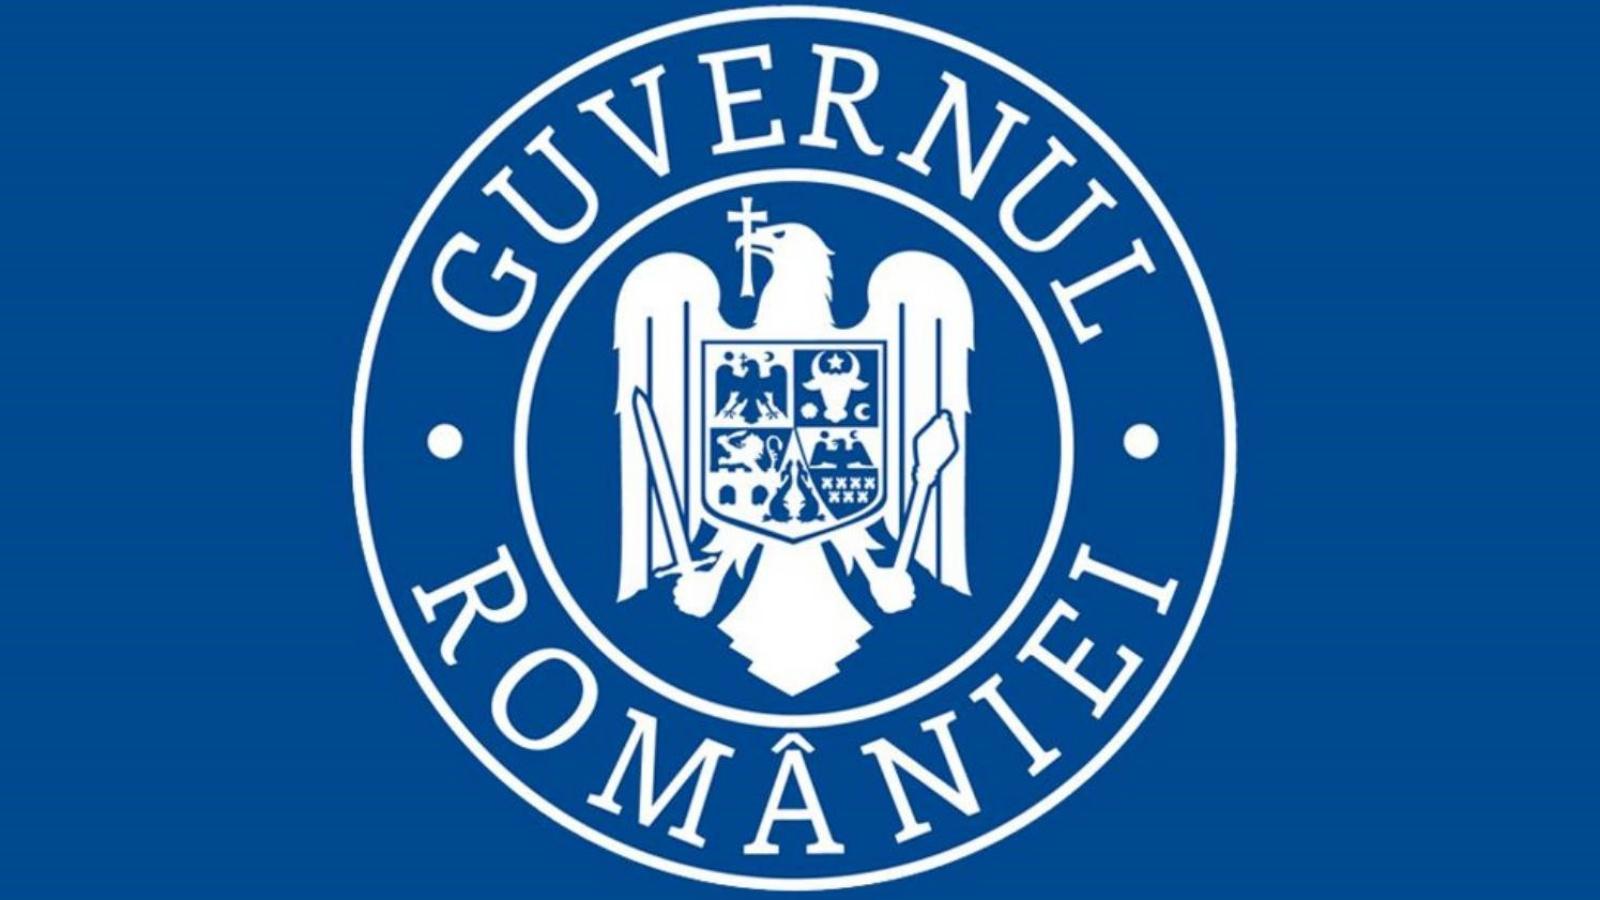 Guvernul Romaniei Varianta Delta a Coronavirus va Depasi Alfa ca Numar de Infectari in Romania